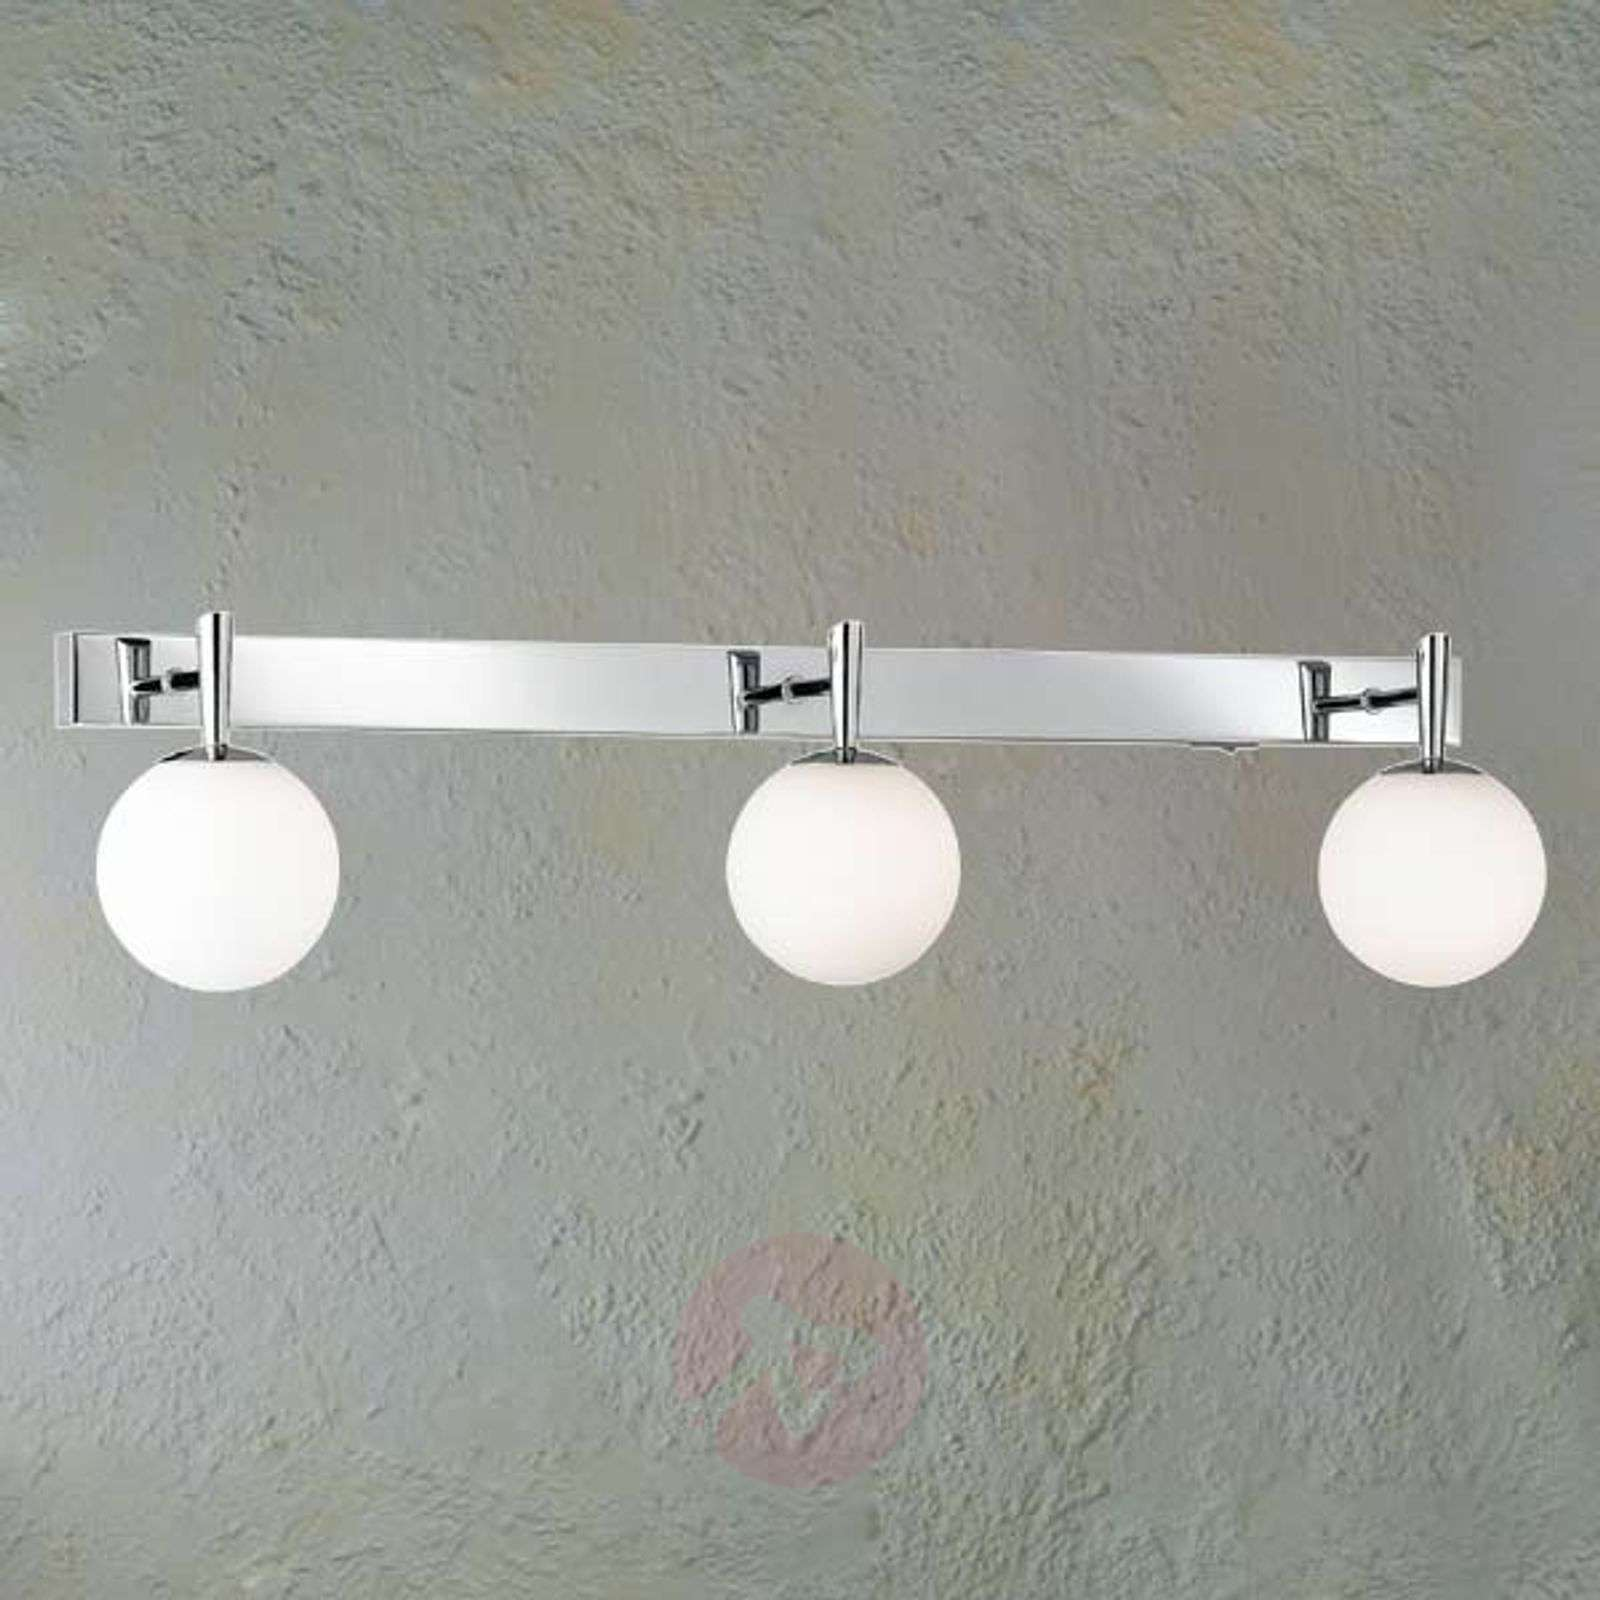 Attractive wall light H2O for the bathroom, 3-bulb-9003759-01